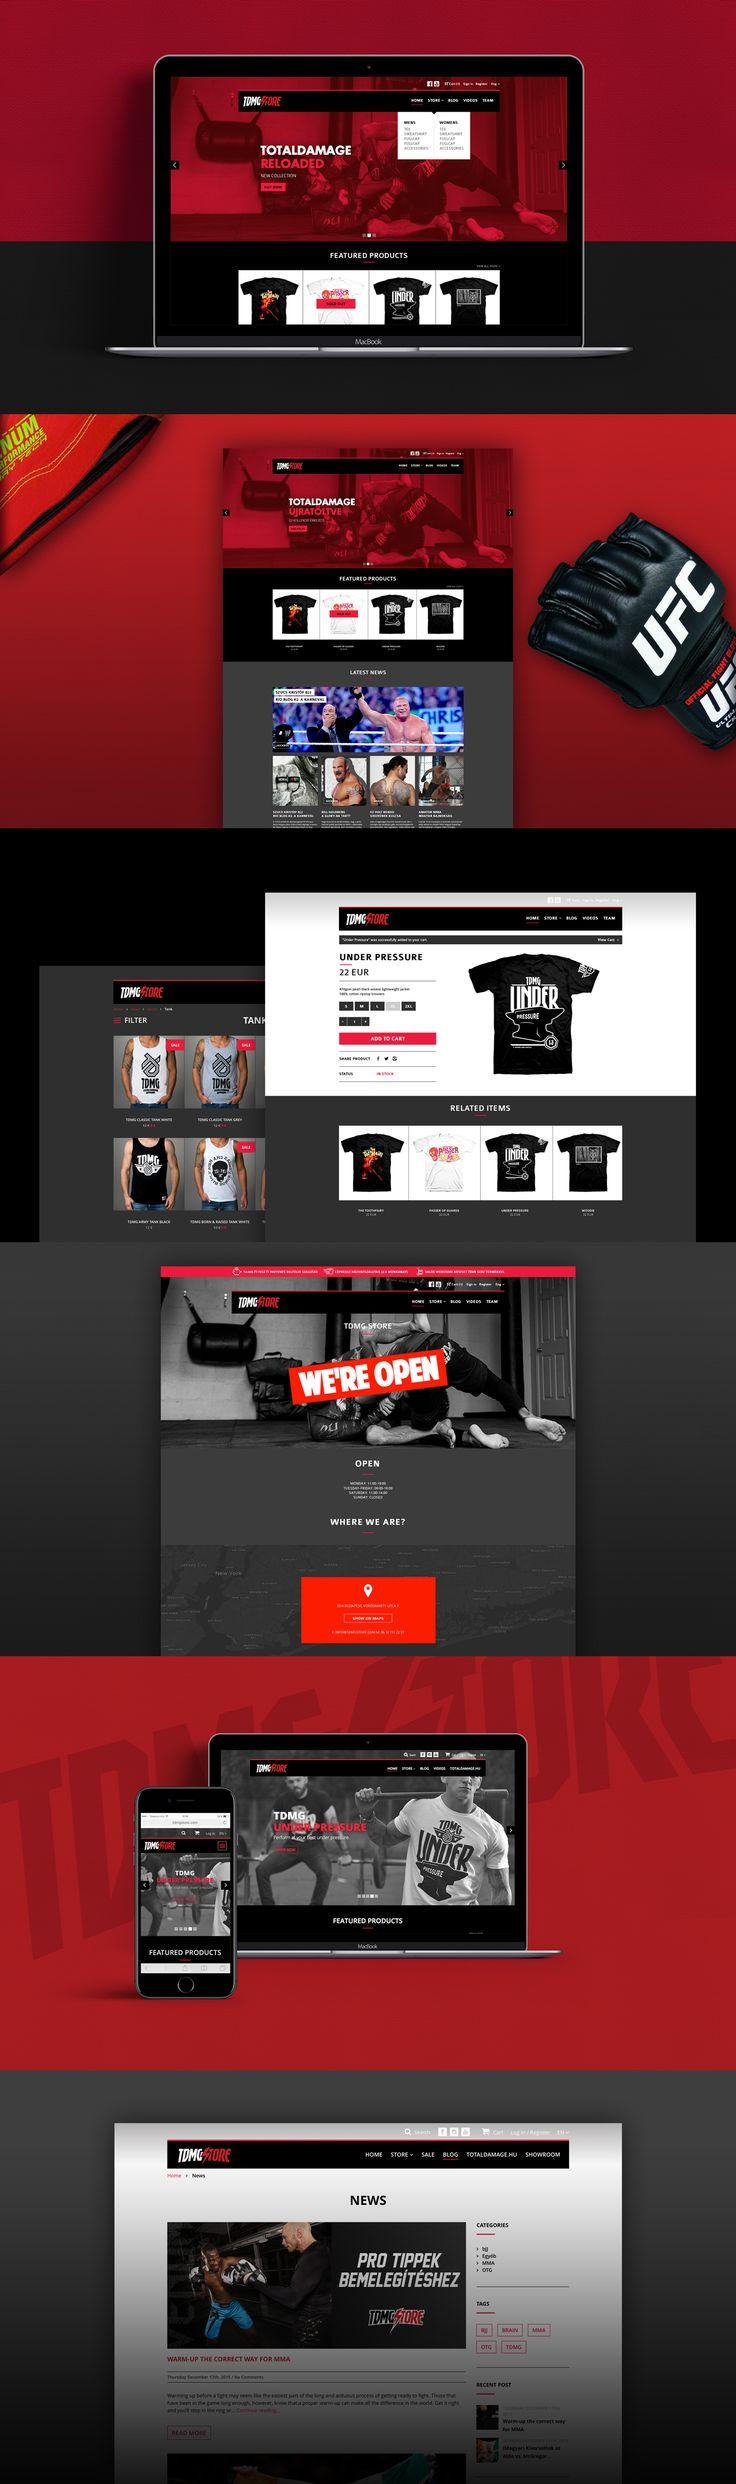 TDMG webshop #web #website #webshop #webdesign #ui #ux #userinterface #interactiondesign #graphic #design #tdmg #karate #mma #ufc #kickbox #box #jiujitsu #figth #fighter